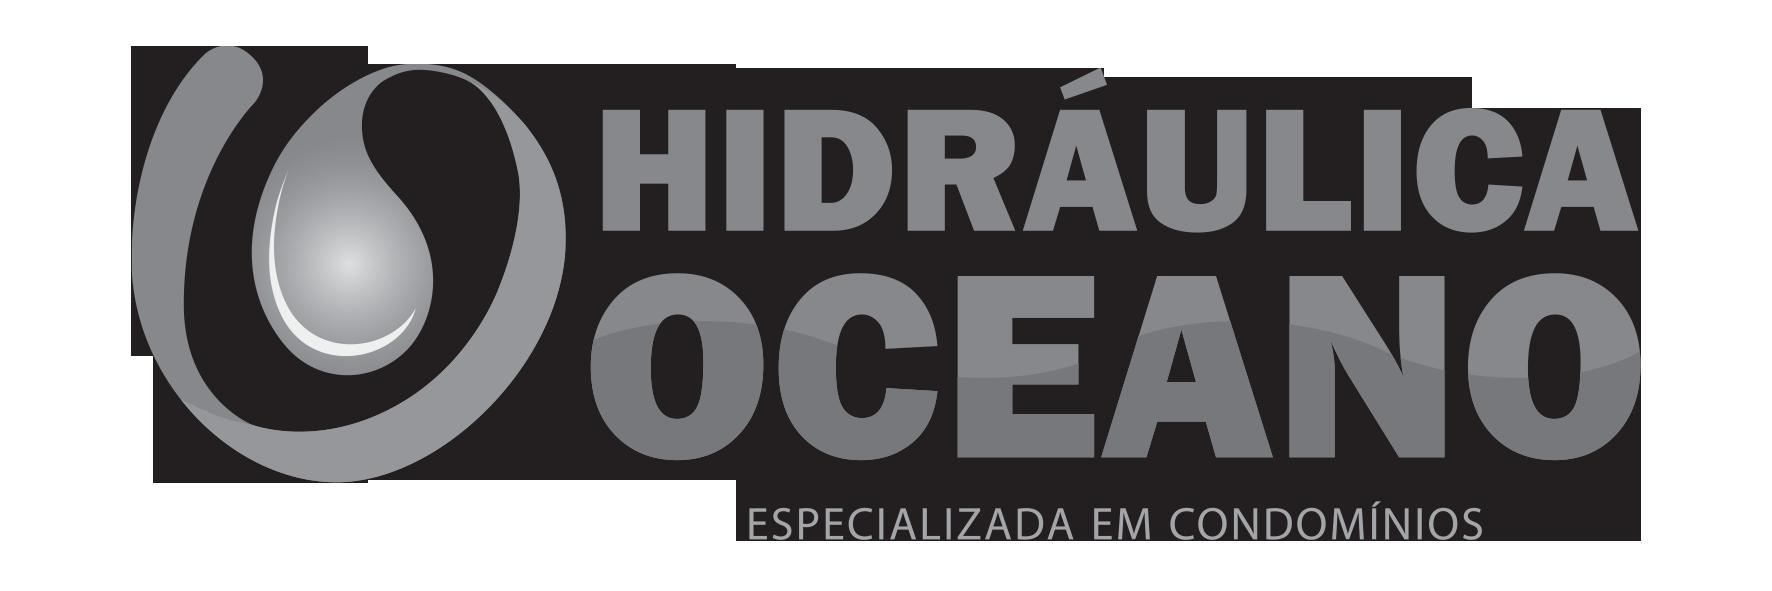 LOGO-MARCA-OCEANO-cinza